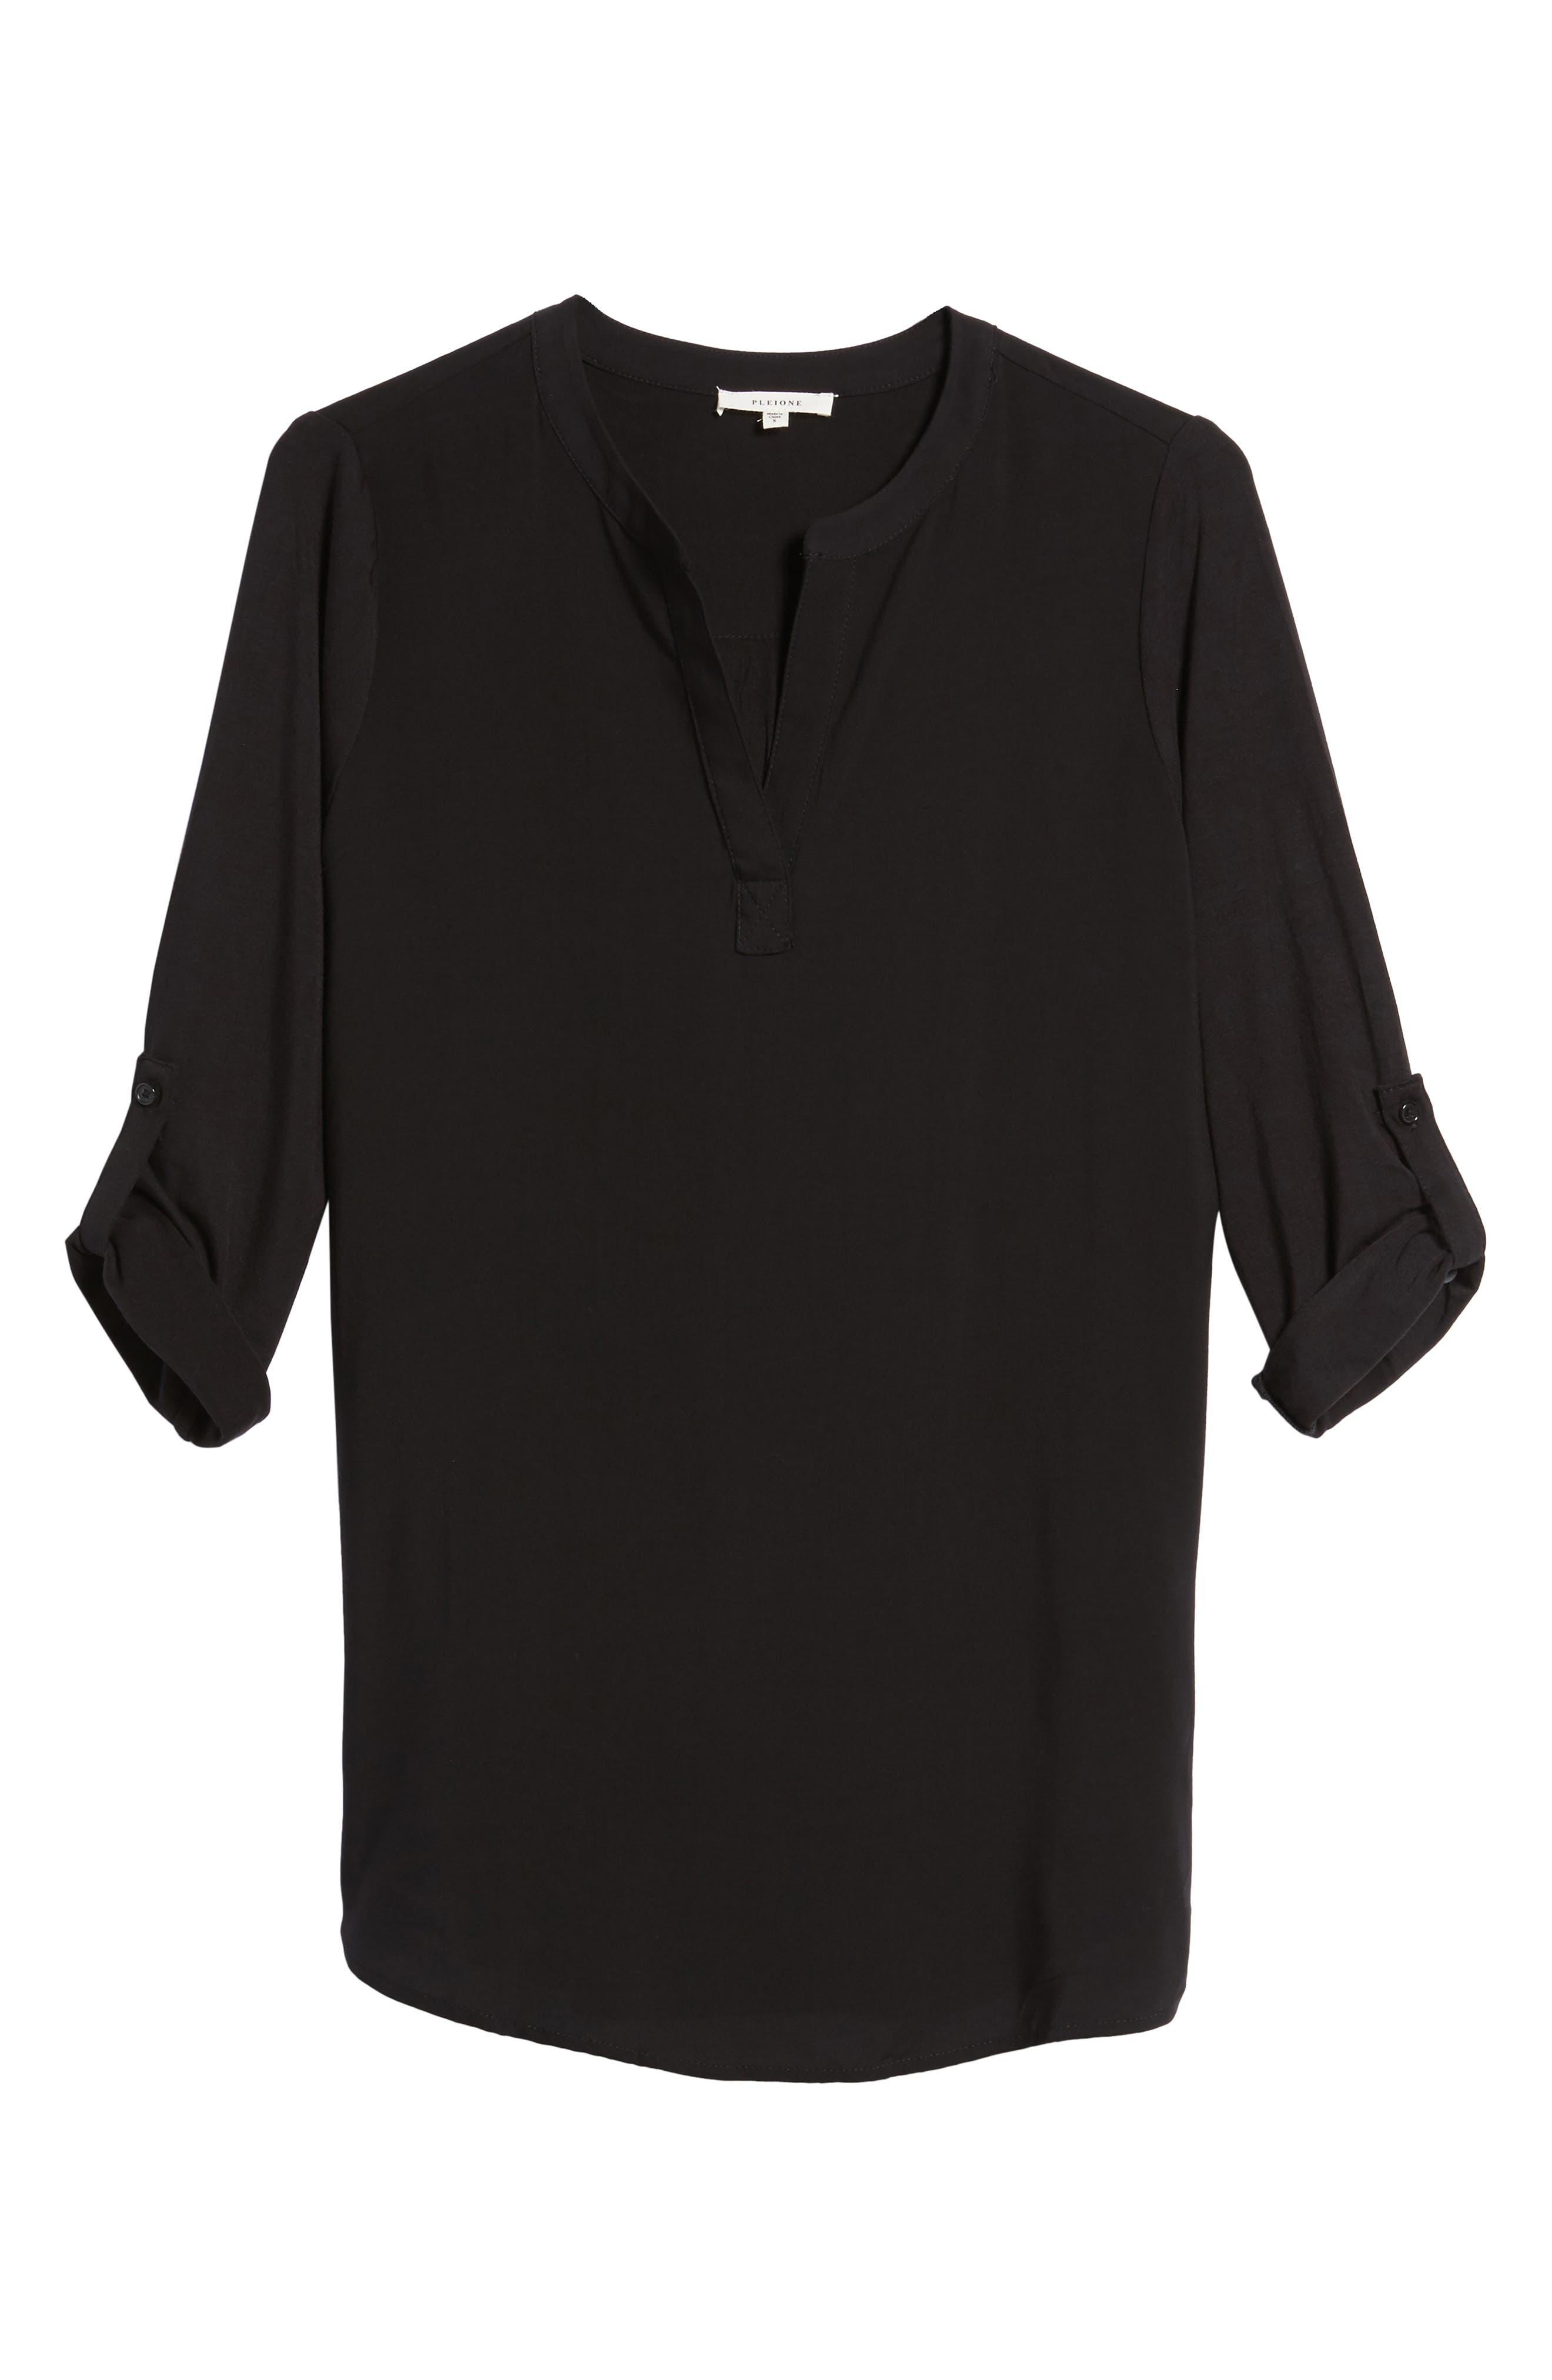 PLEIONE,                             Split Neck Roll Sleeve Tunic,                             Main thumbnail 1, color,                             001